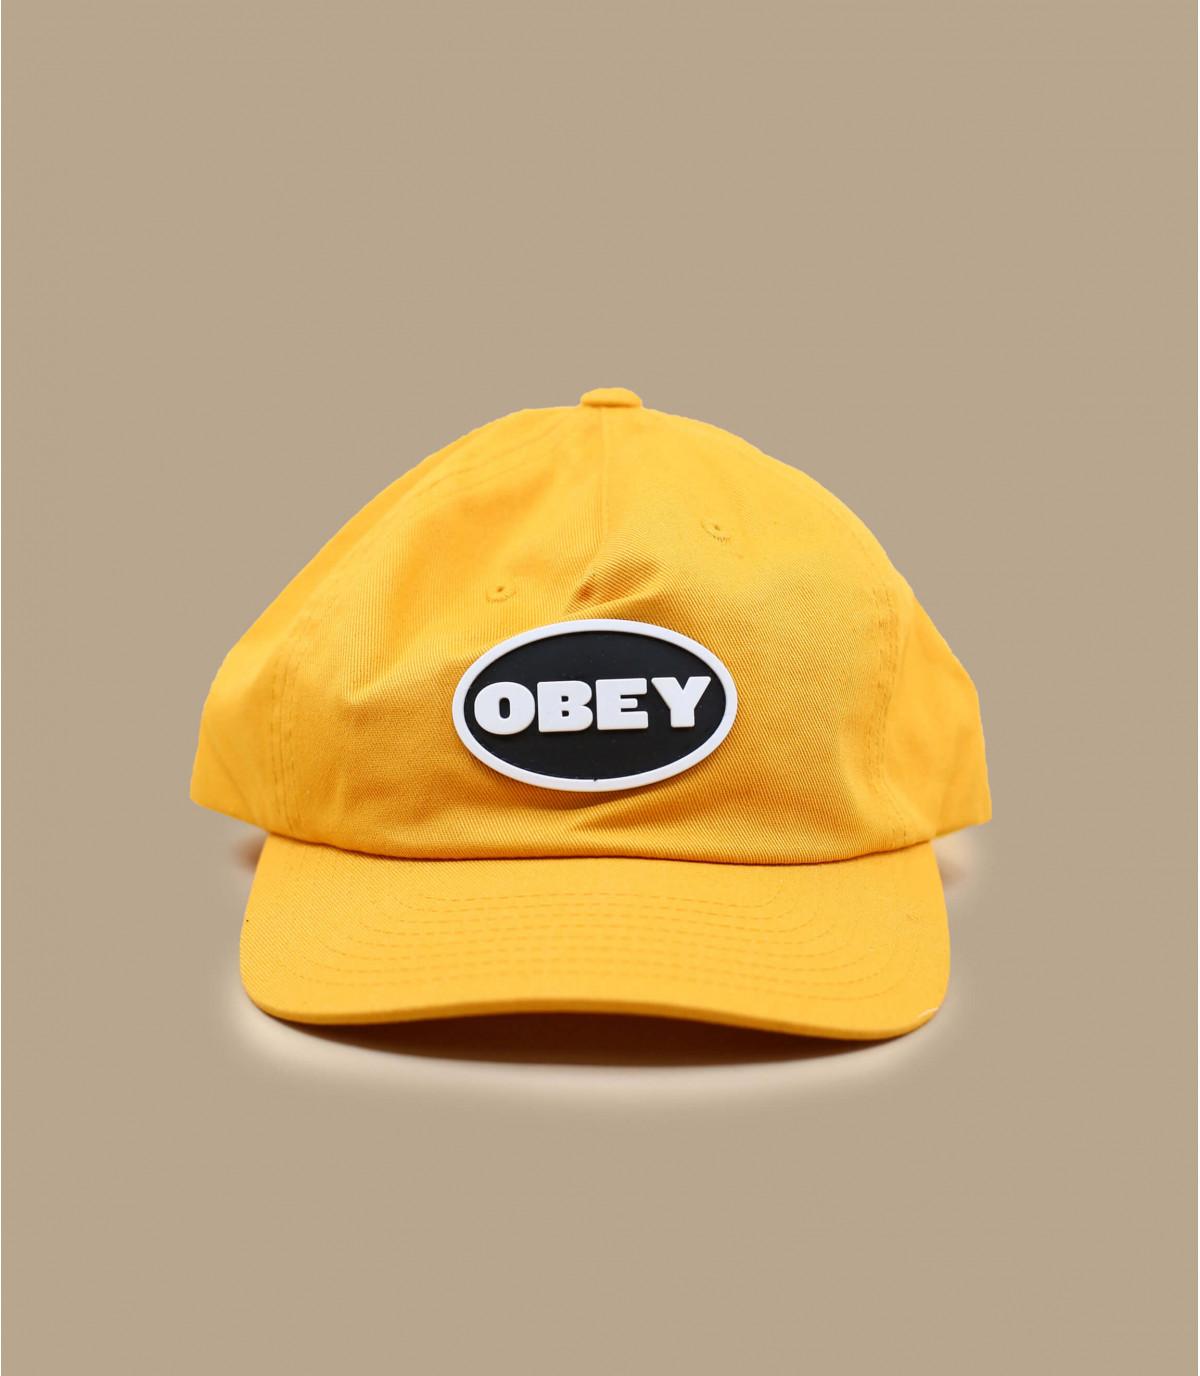 Obey yellow 5 panel cap